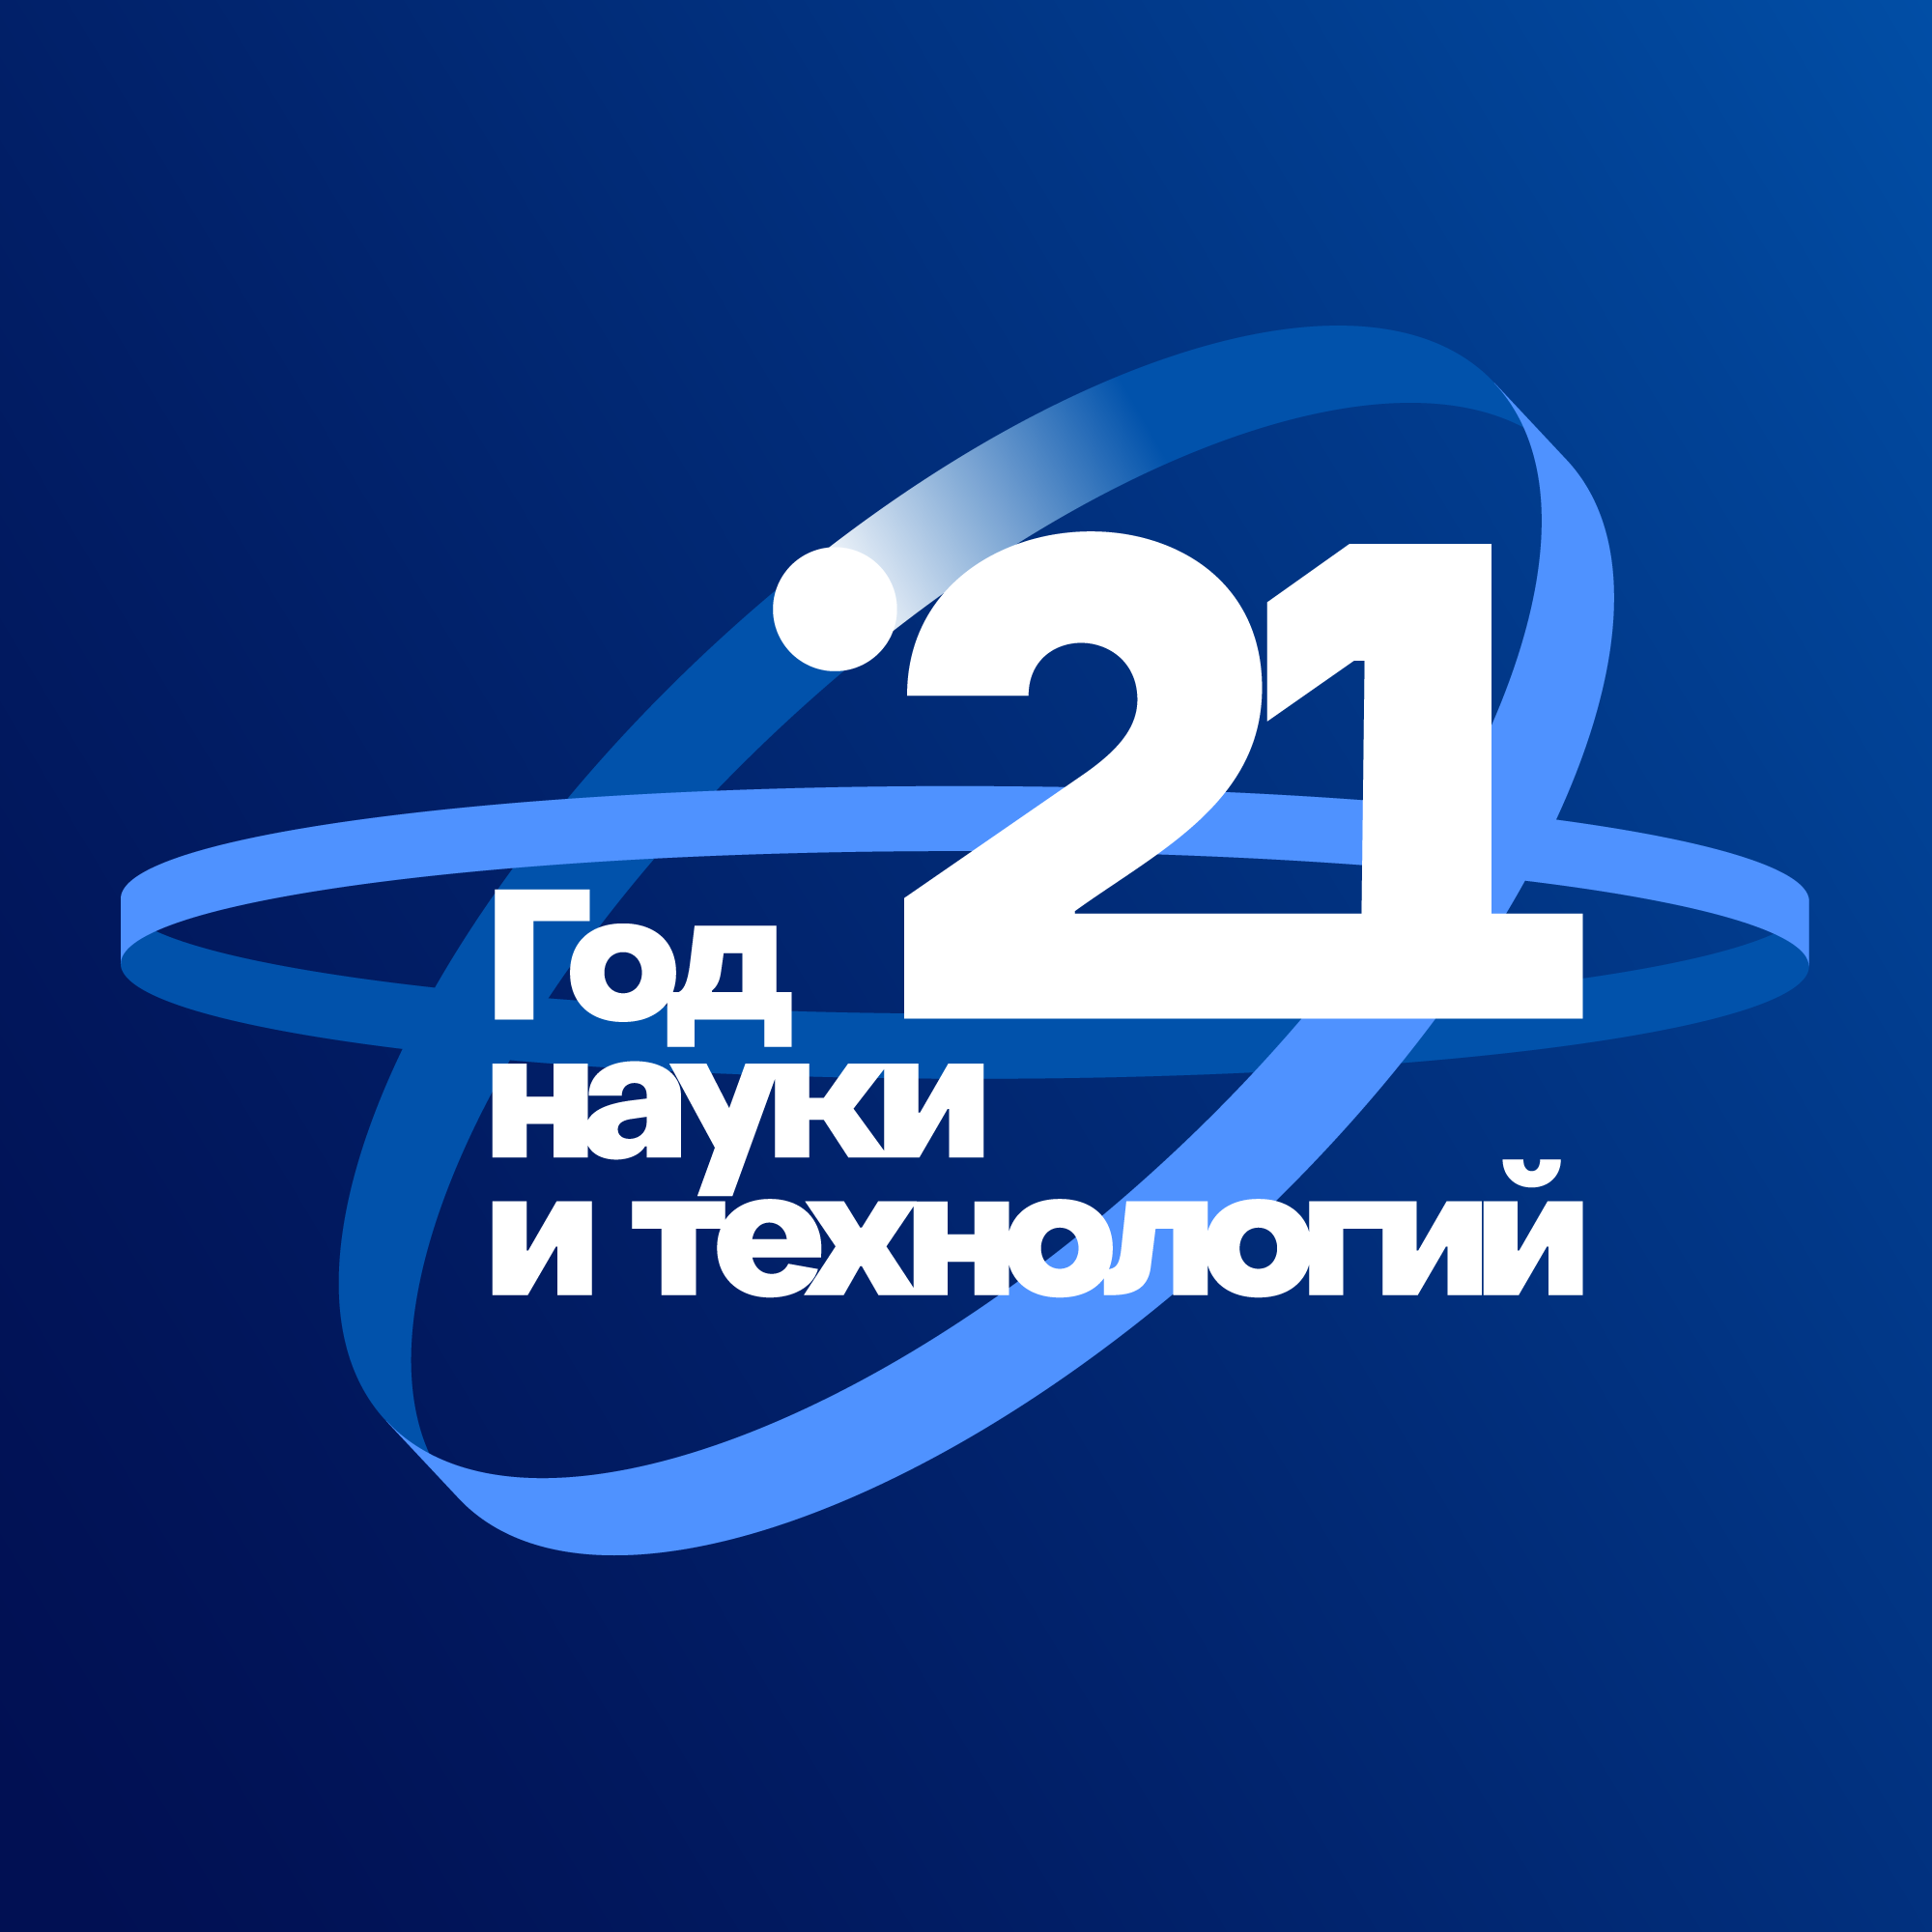 Год науки и технологий 21